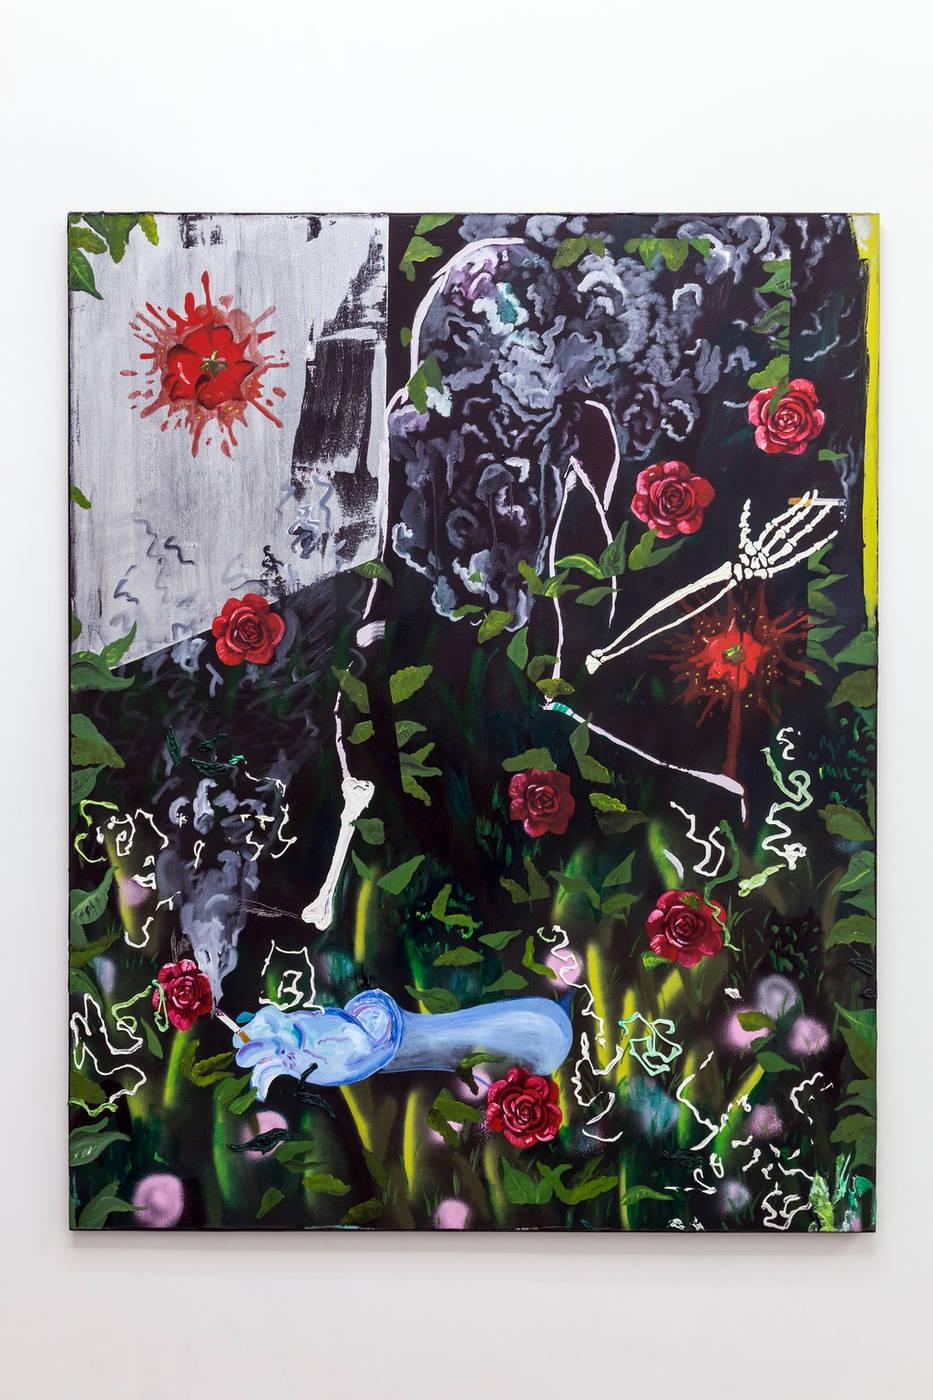 Morgan Mandalay Mixed reviews, 2016 oil, acrylic paint and spray paint on canvas 163 x 152 cm courtesy Acappella anc D. Donzelli ph.